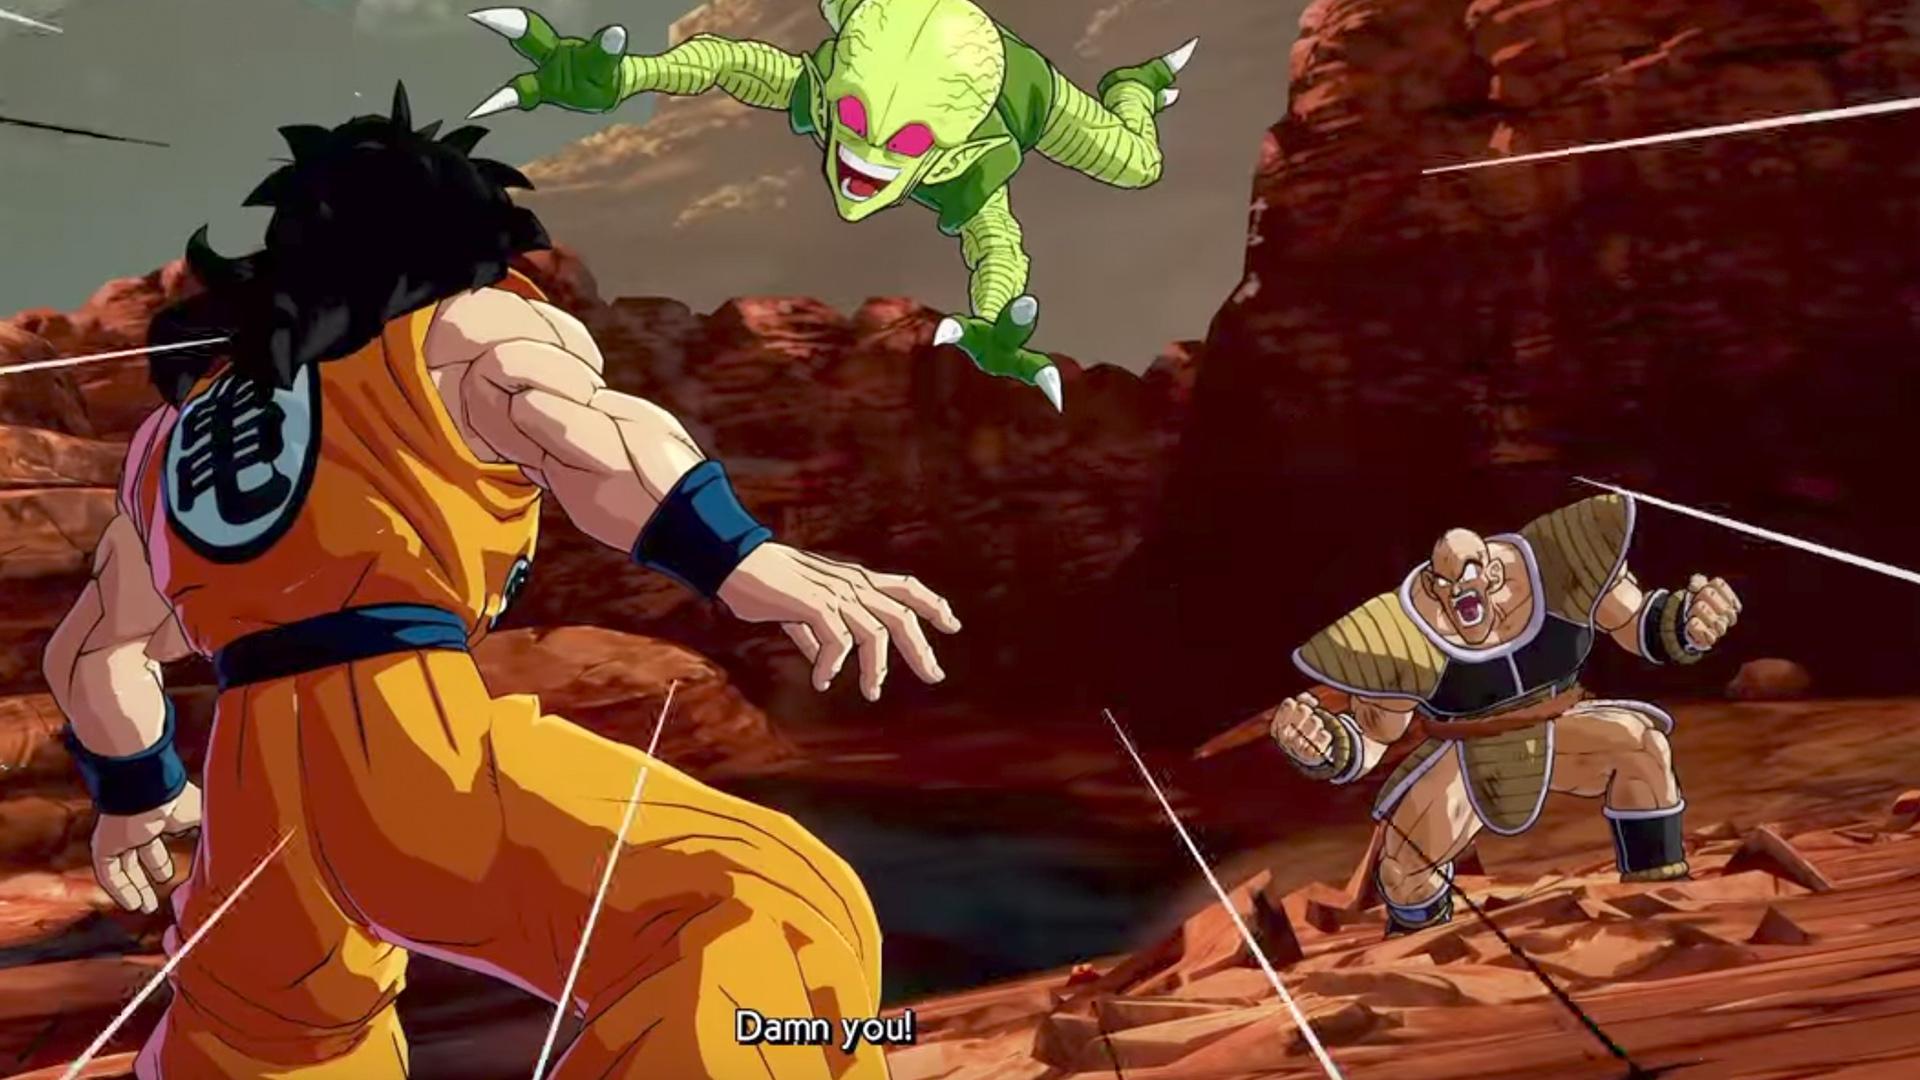 Gracias a Dragon Ball FighterZ, Yamcha finalmente pudo vengarse de la humillante derrota que le propinó Nappa